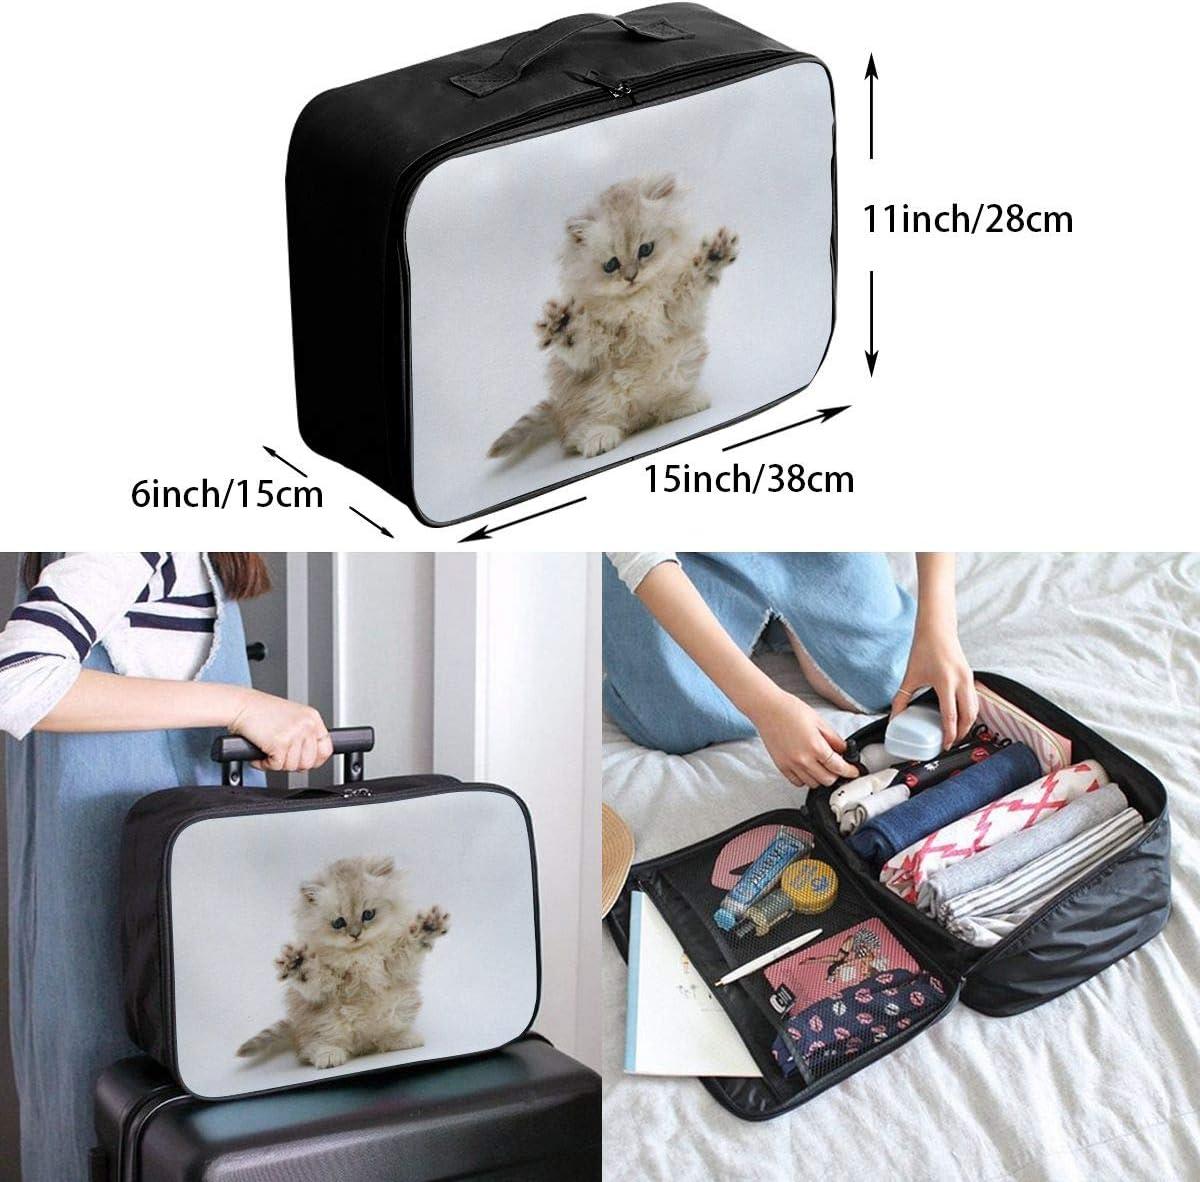 Yunshm White Pitiful Cute Cat Personalized Trolley Handbag Waterproof Unisex Large Capacity For Business Travel Storage